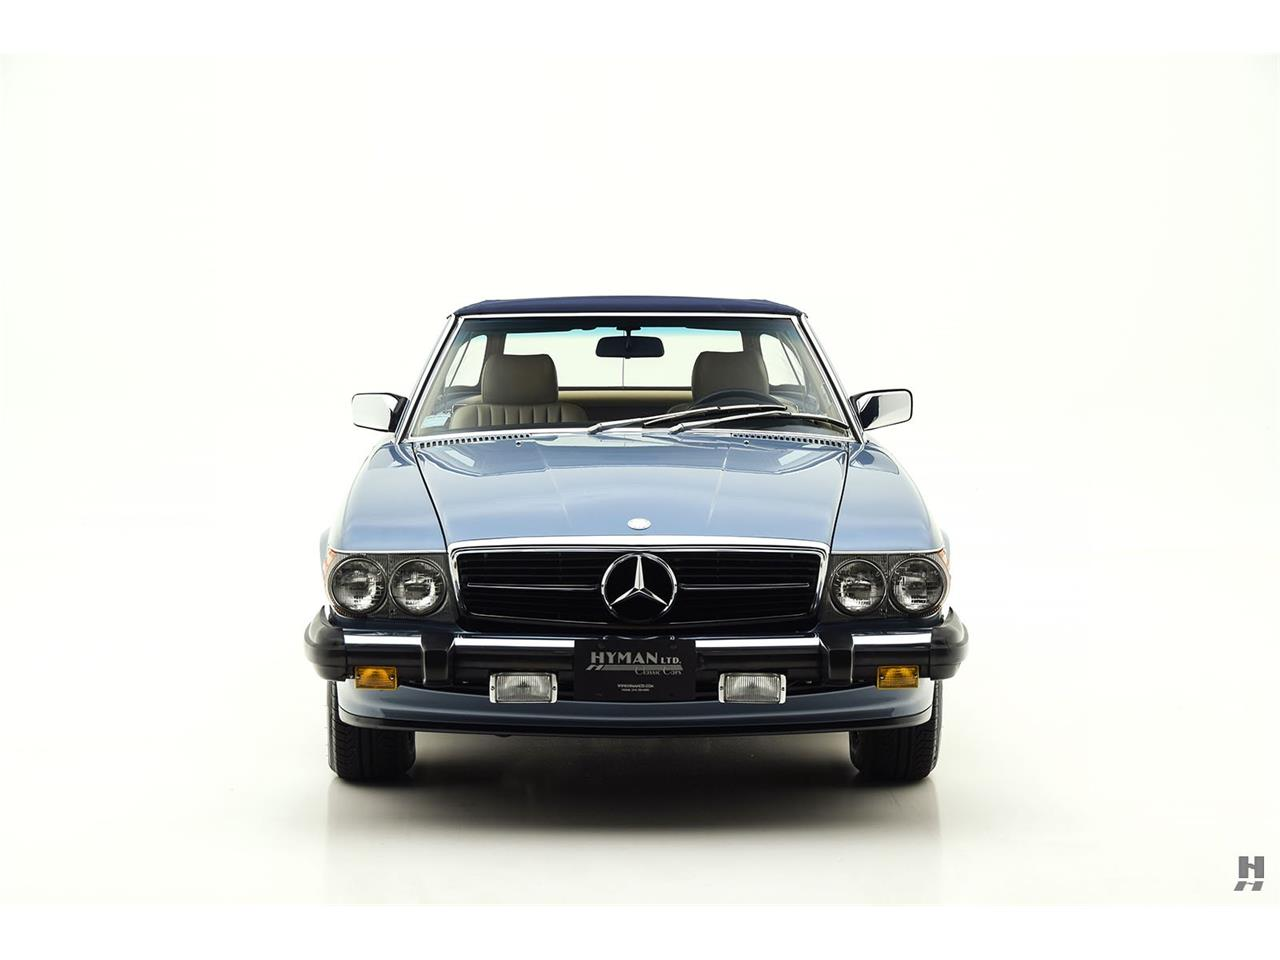 Large Picture of '87 Mercedes-Benz 560SL located in Saint Louis Missouri - LENL